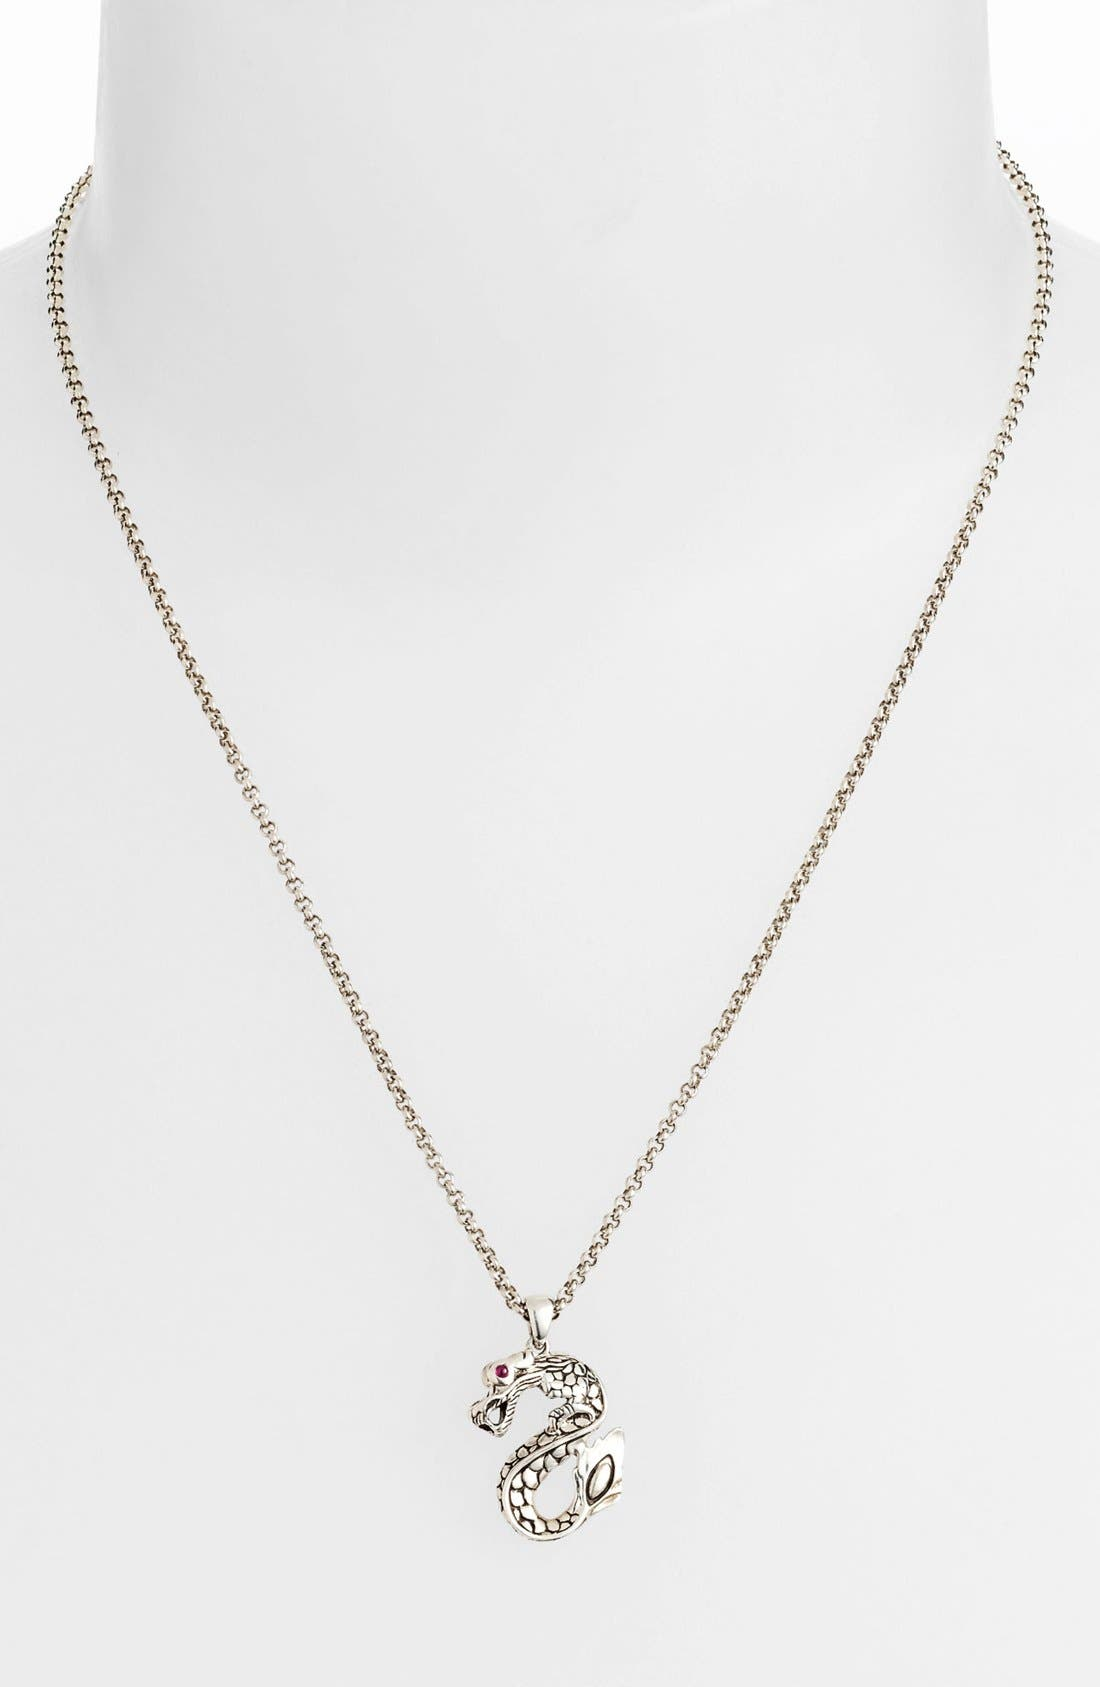 Alternate Image 1 Selected - John Hardy 'Naga Batu' Dragon Pendant Necklace